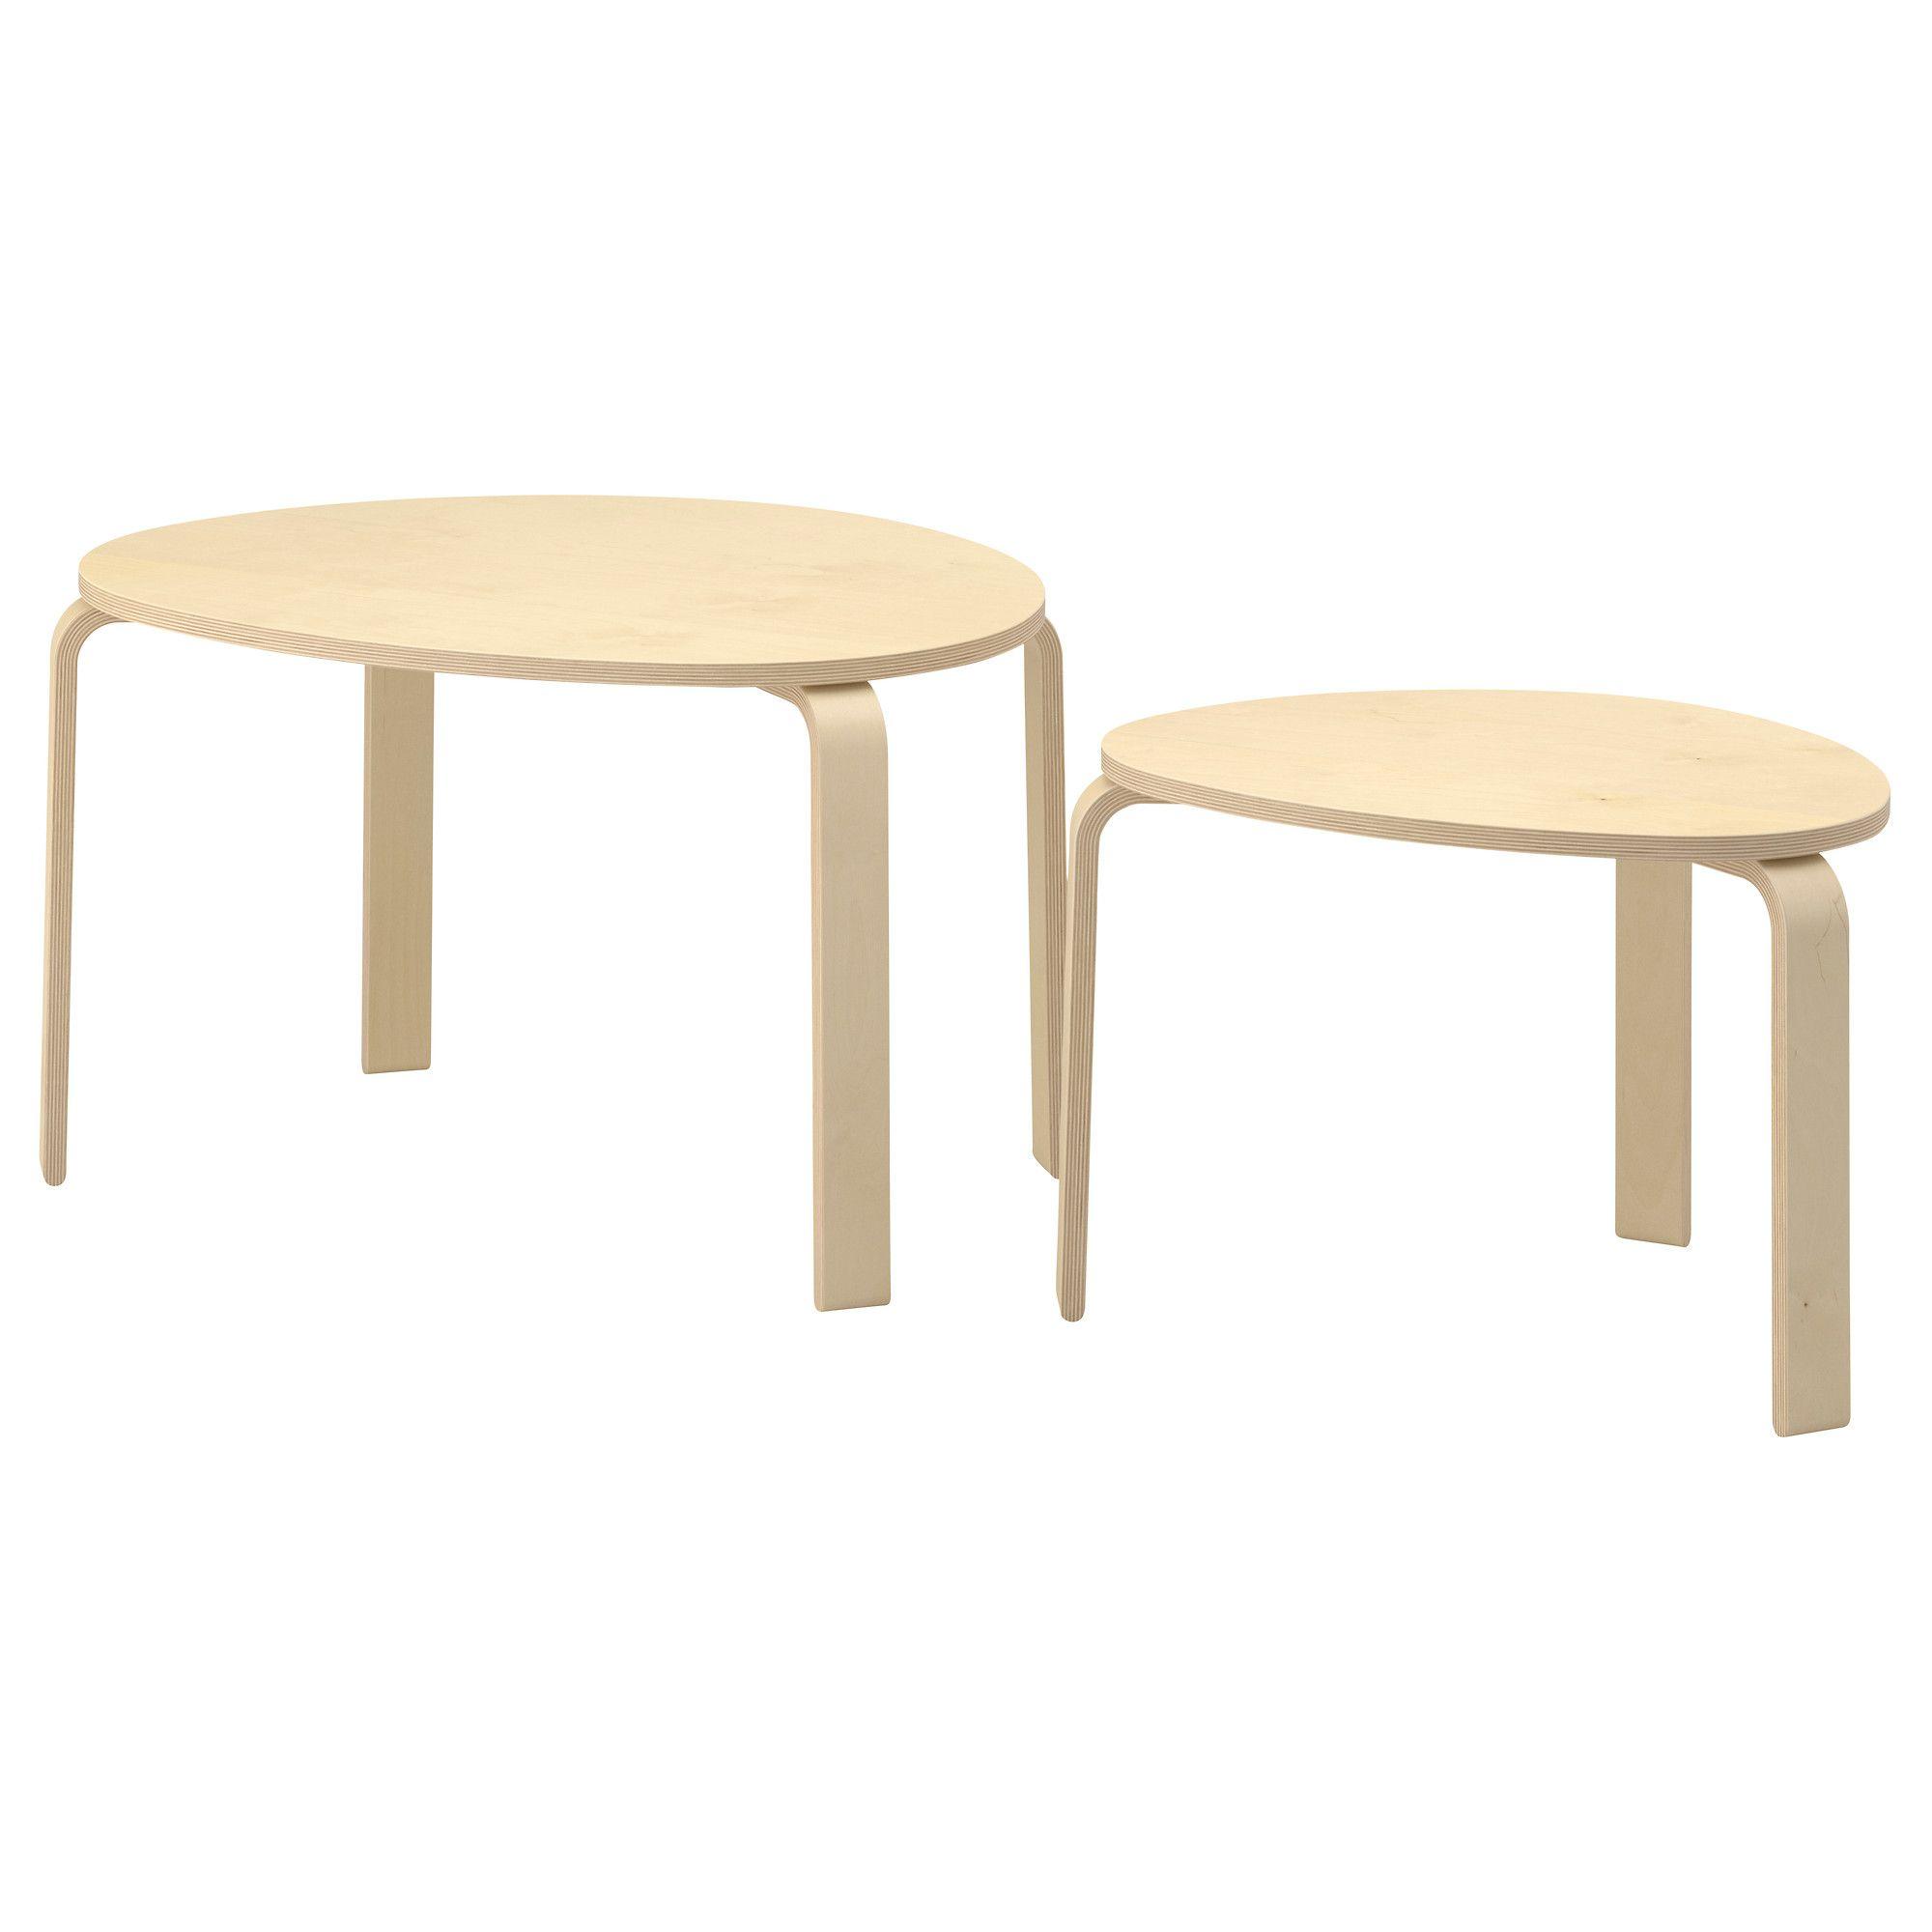 IKEA - SVALSTA Nesting tables, set of 2 birch veneer | Pinterest ...